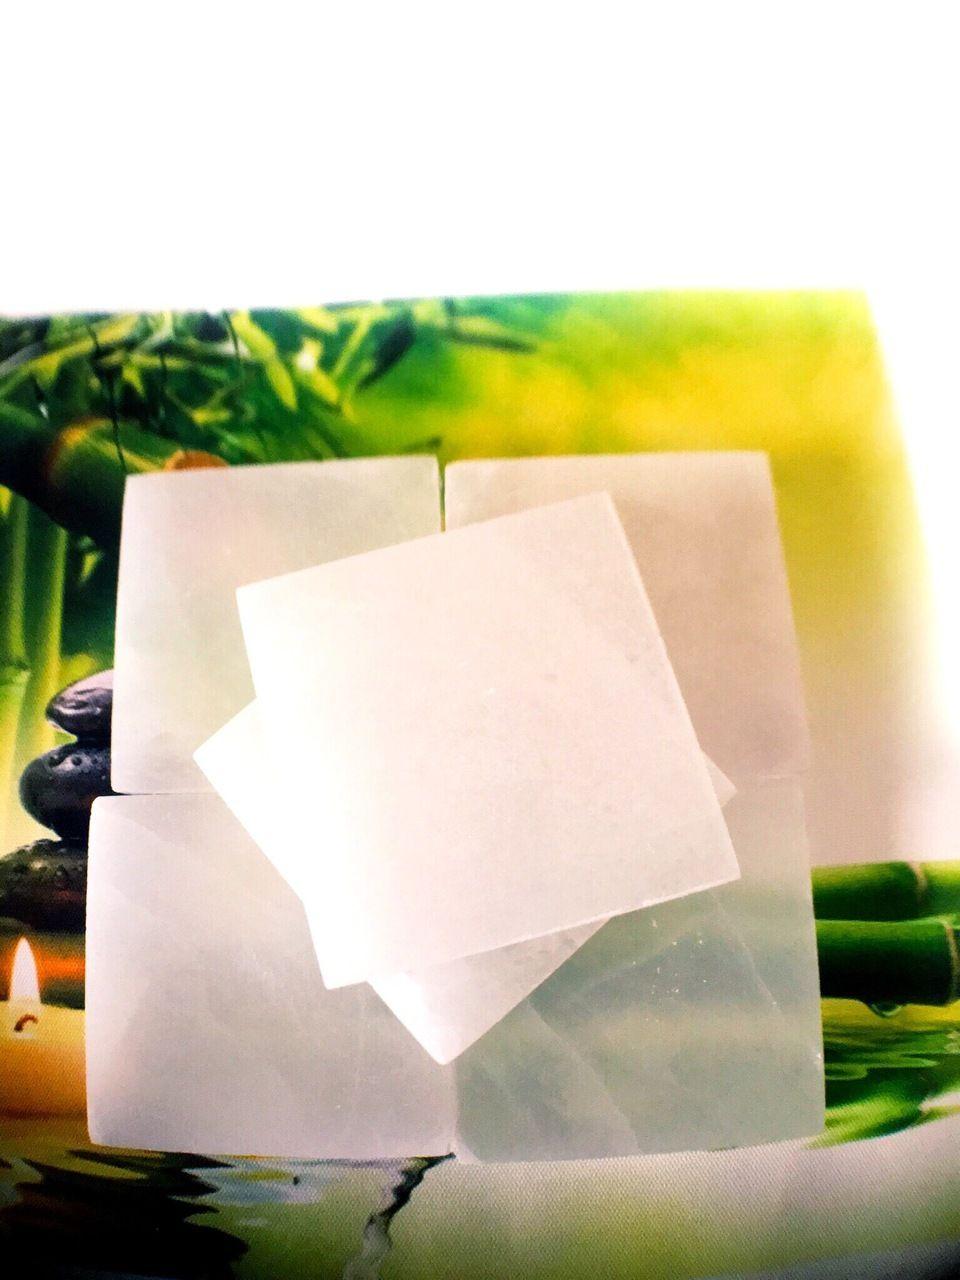 Park Art|My WordPress Blog_How To Cleanse Selenite Plate